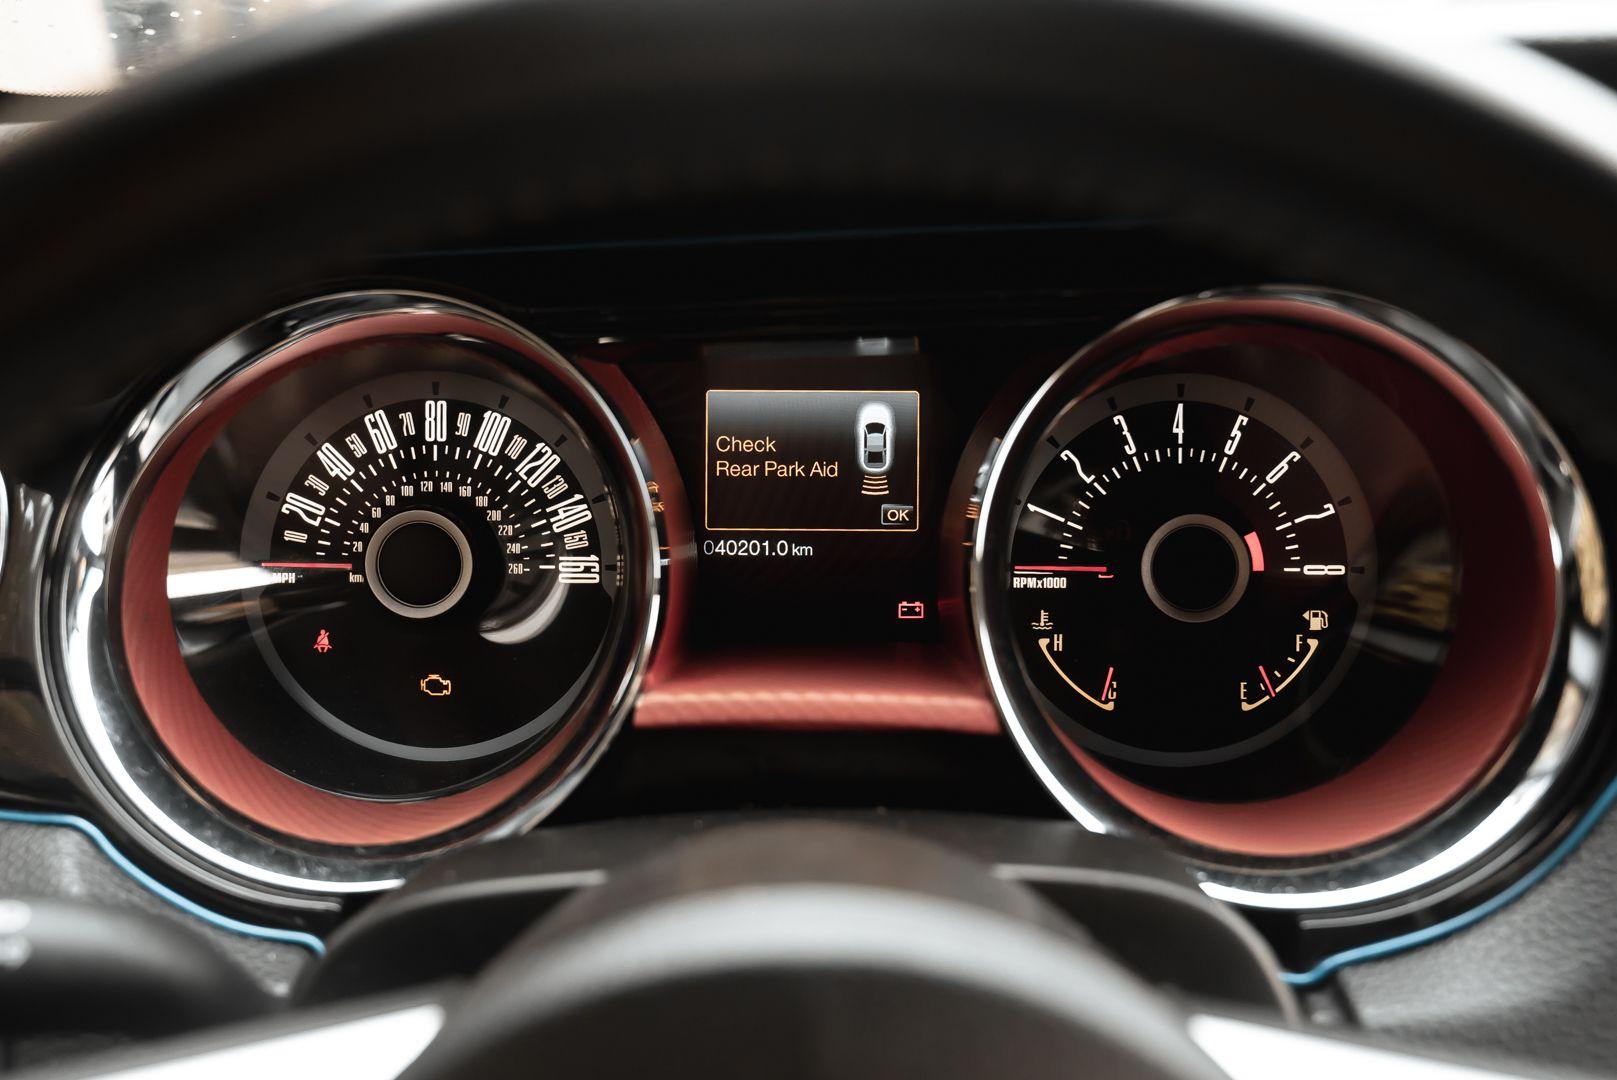 2012 Ford Mustang 5.0 V8 82103